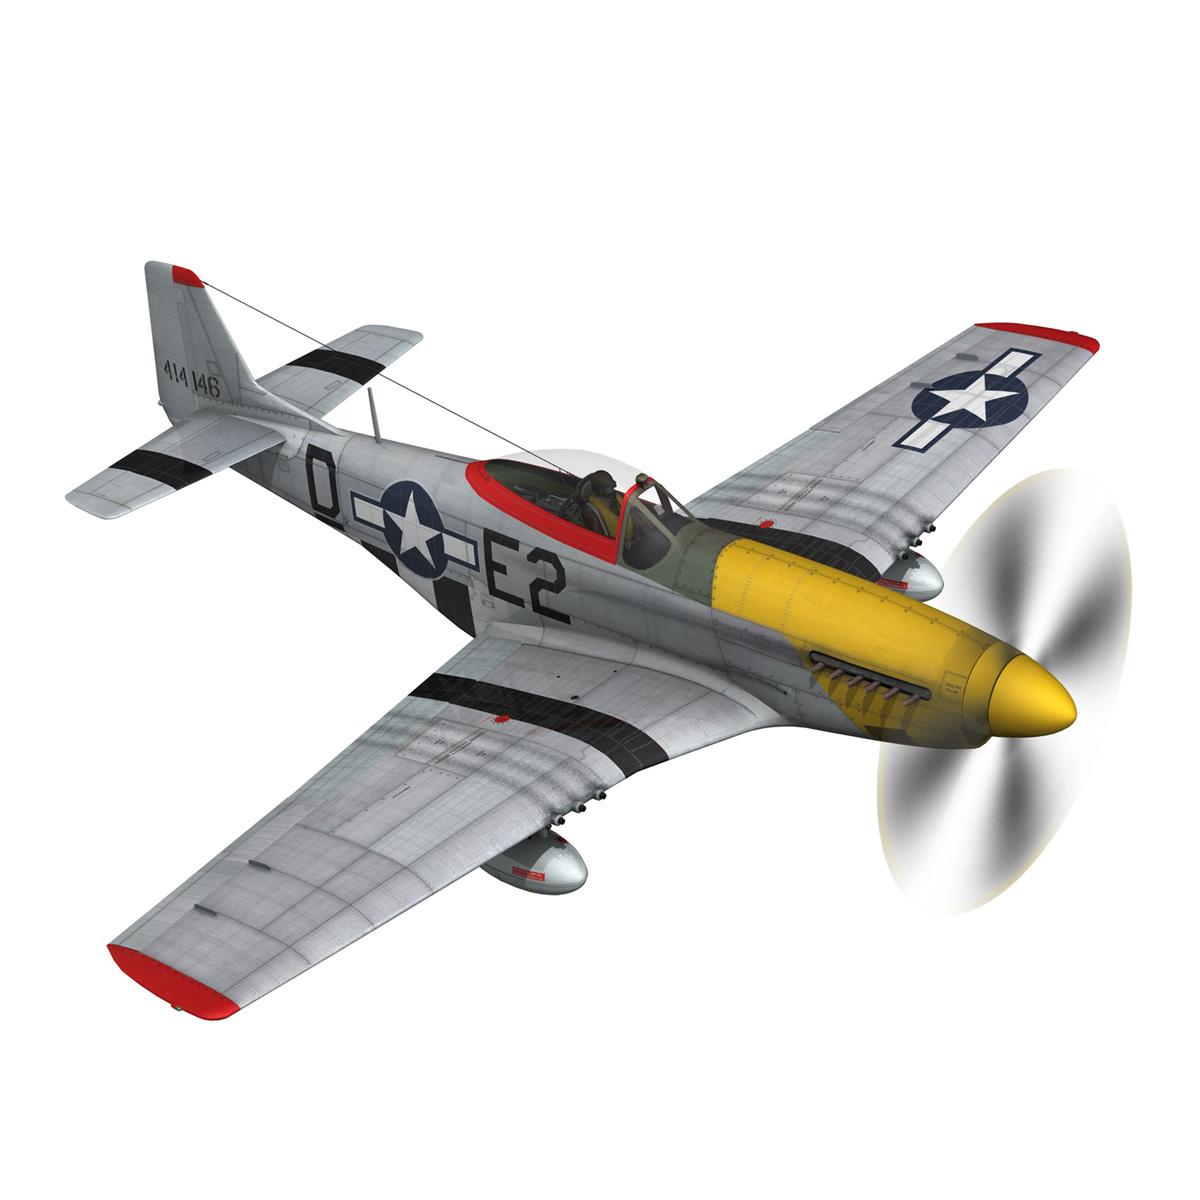 north american p-51d – mustang – detroit miss 3d model 3ds fbx c4d lwo obj 267599